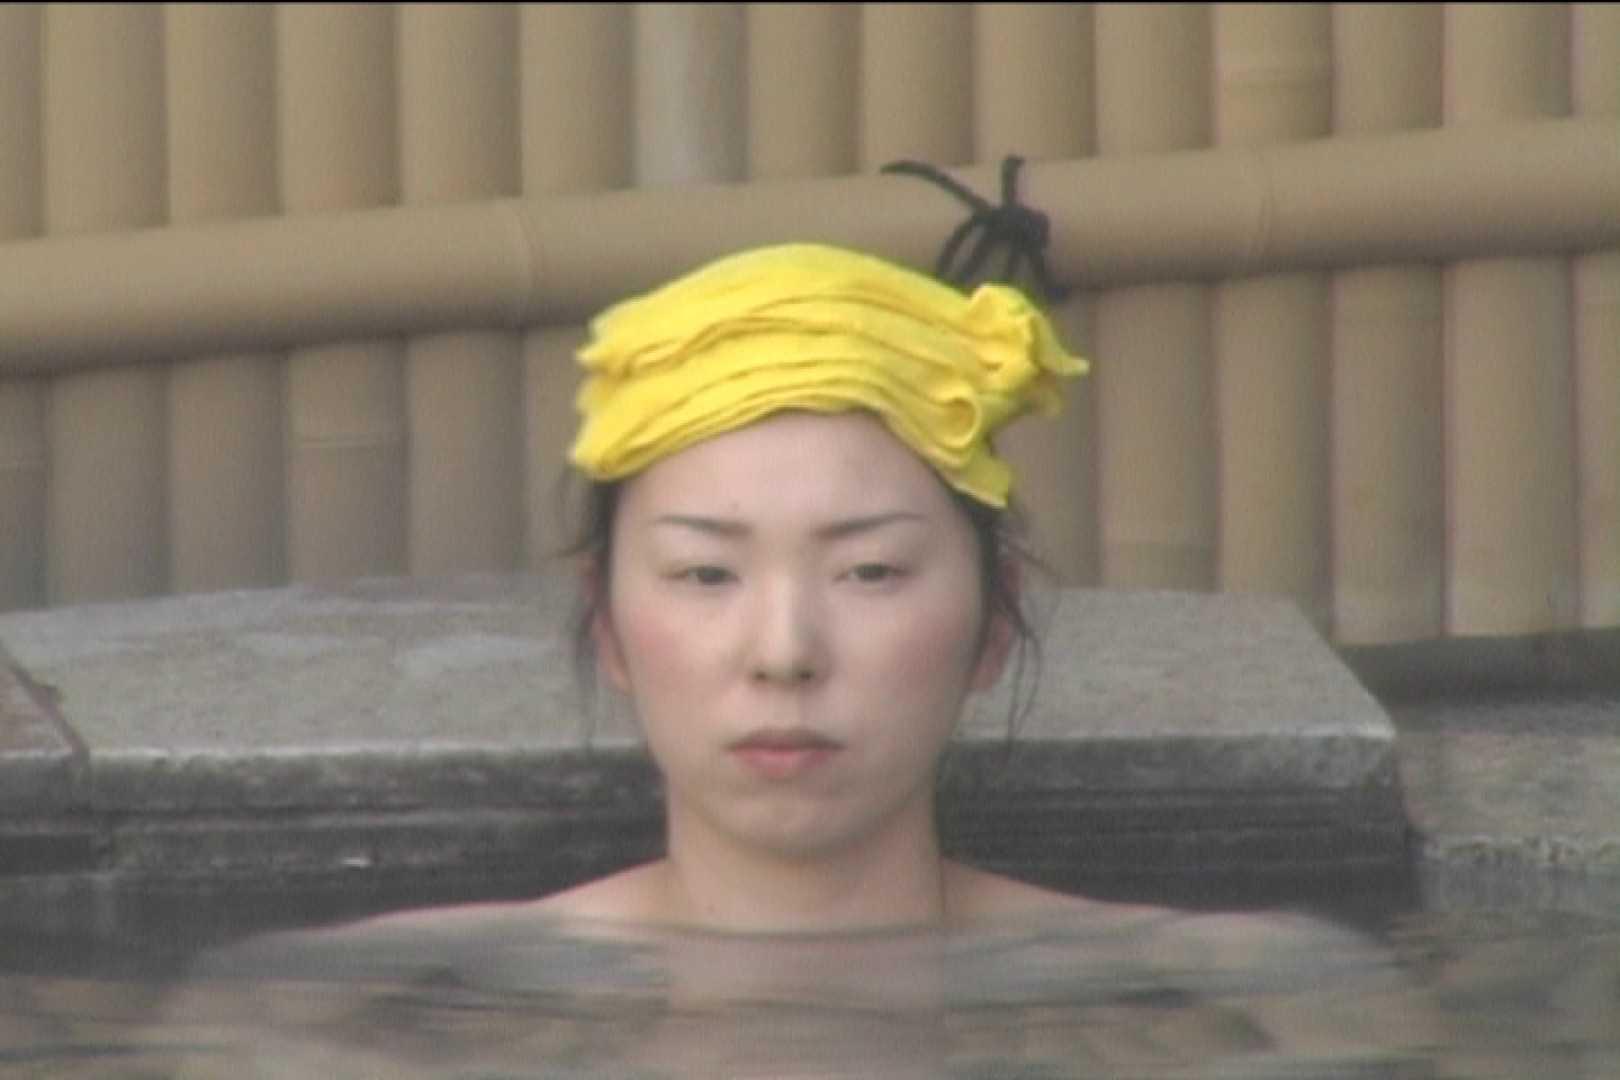 Aquaな露天風呂Vol.529 盗撮映像  51Pix 24